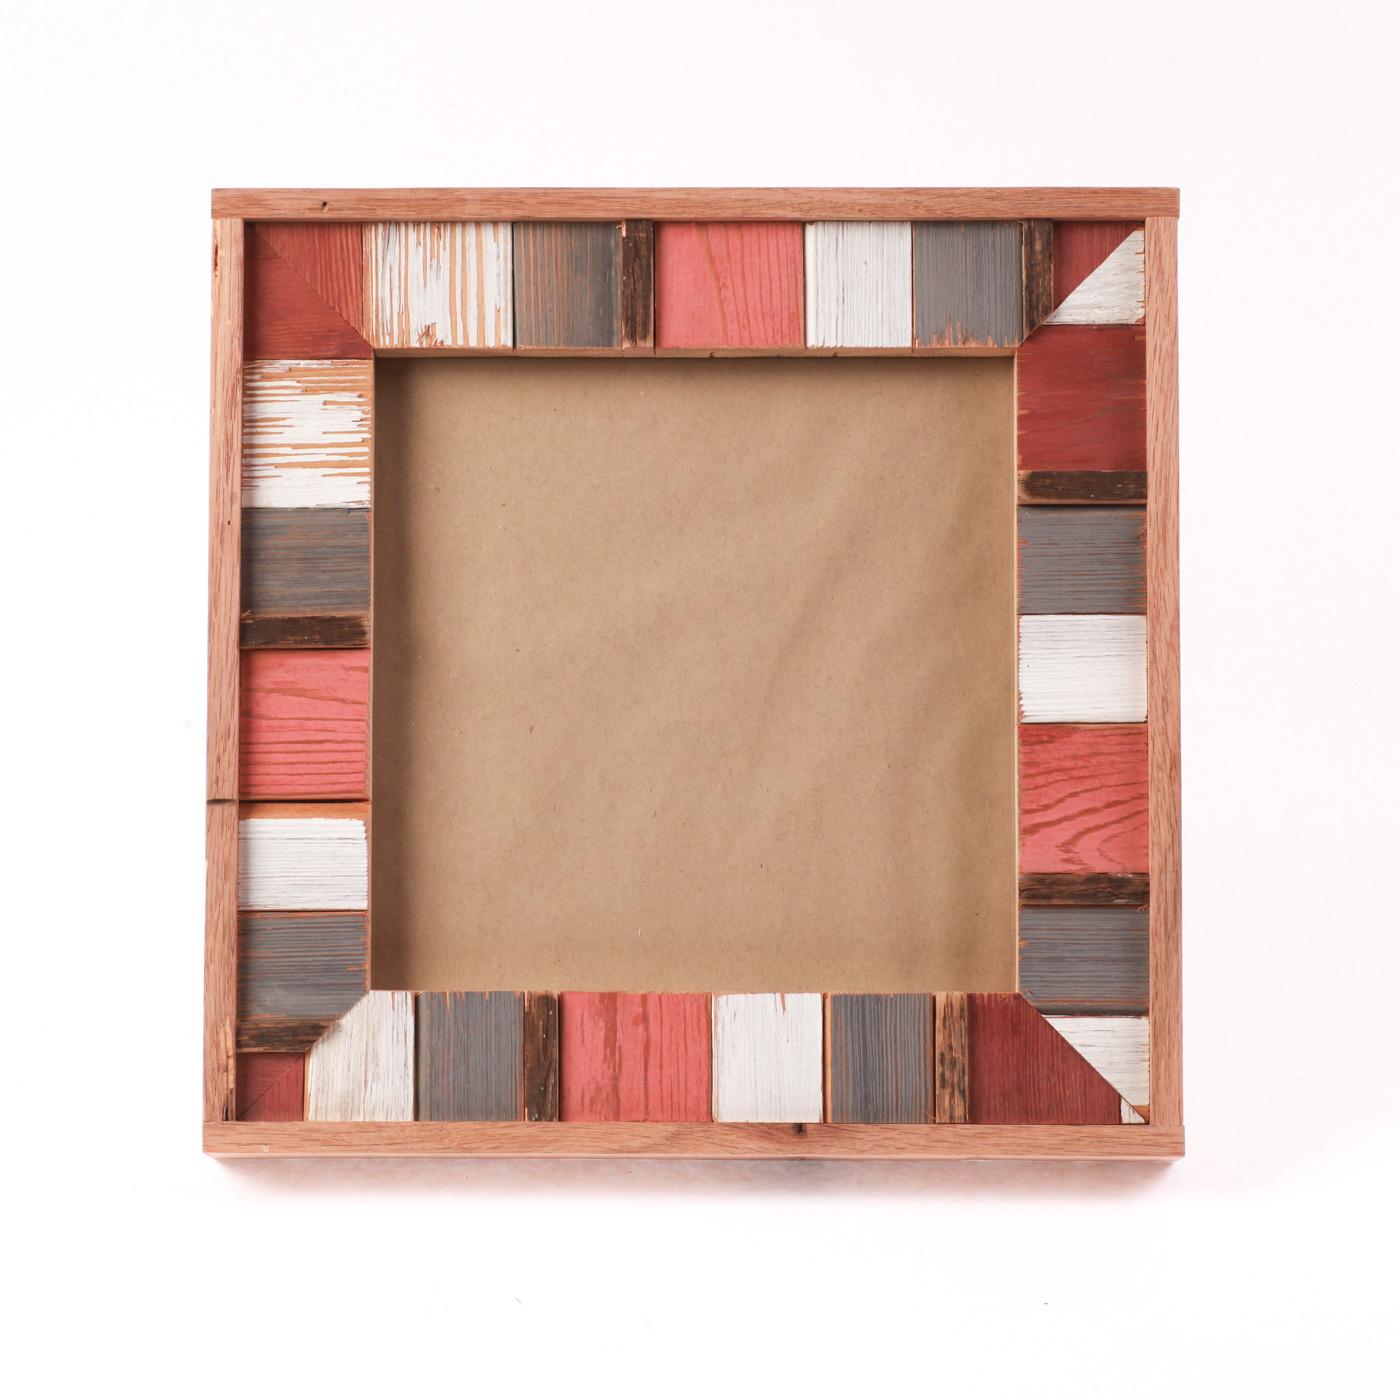 "Artisan, Eco-Friendly, Designer L7 Frame Red Clay 8"" x 8"""